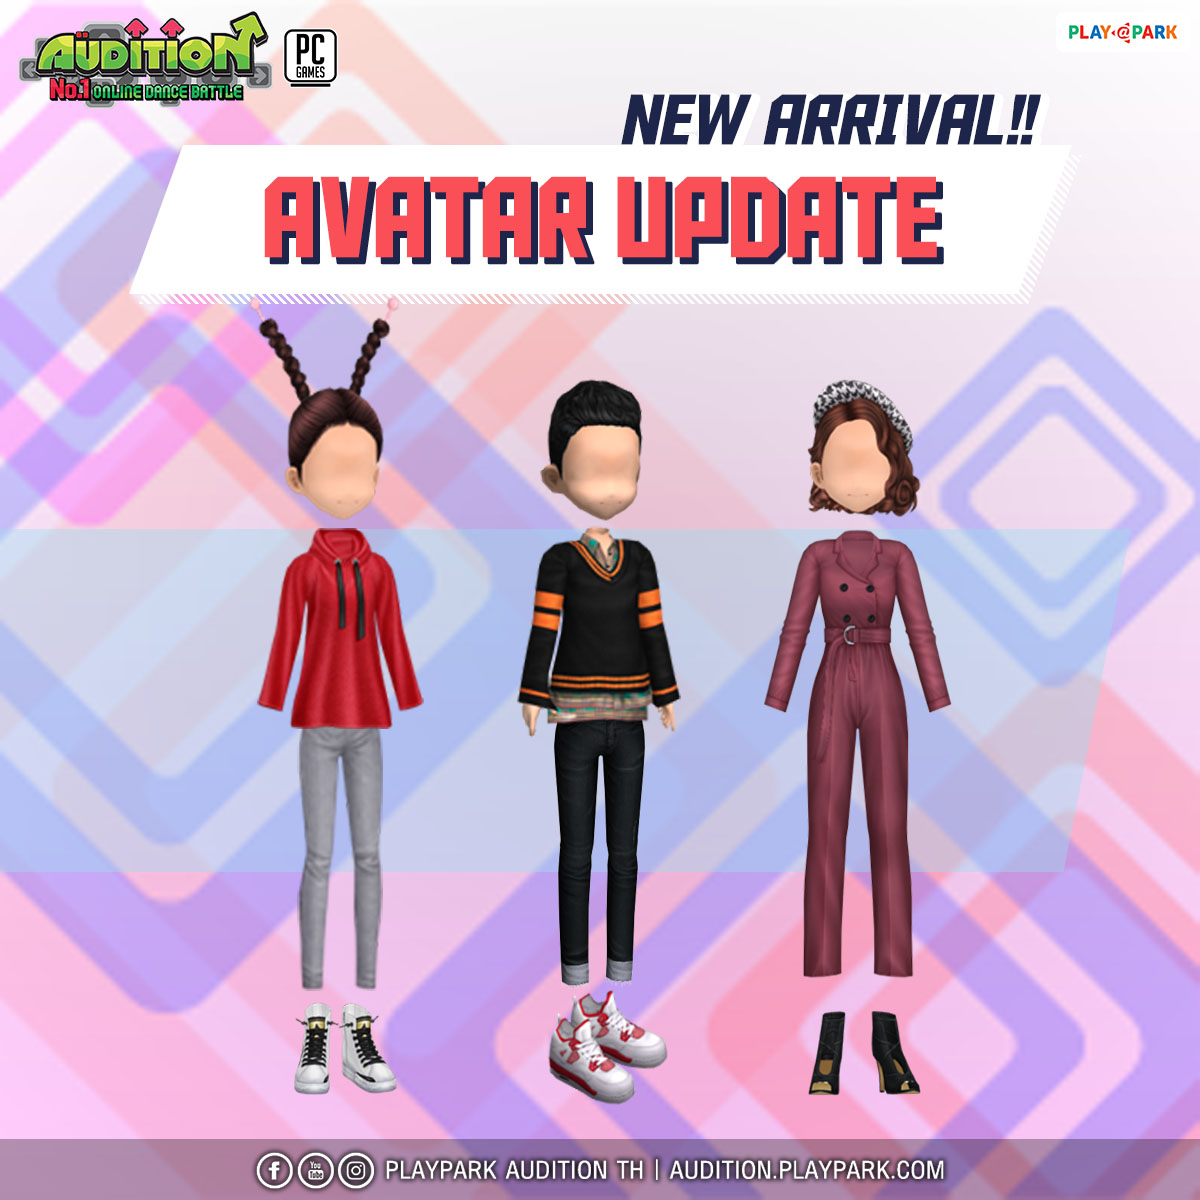 [AUDITION] 25 มีนาคมนี้ อัปเดตเพลงใหม่, แหวนใหม่ และบัตรเปลี่ยนชื่อ Mascot